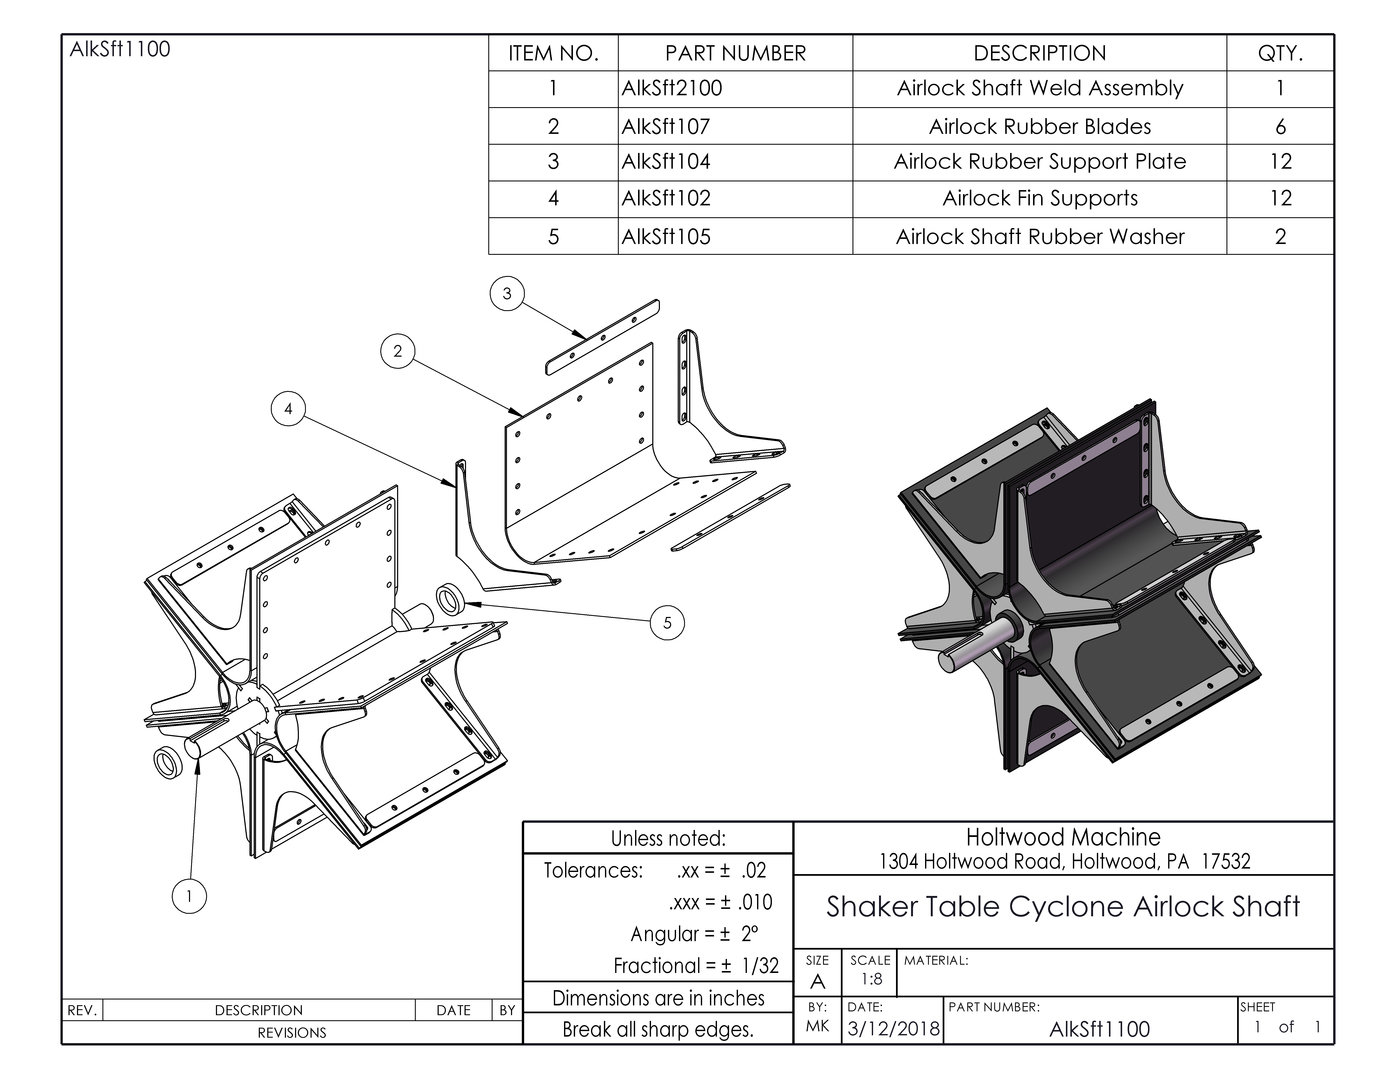 SolidWorks Designs: Parts and Assemblies by Matthew Kilareski at